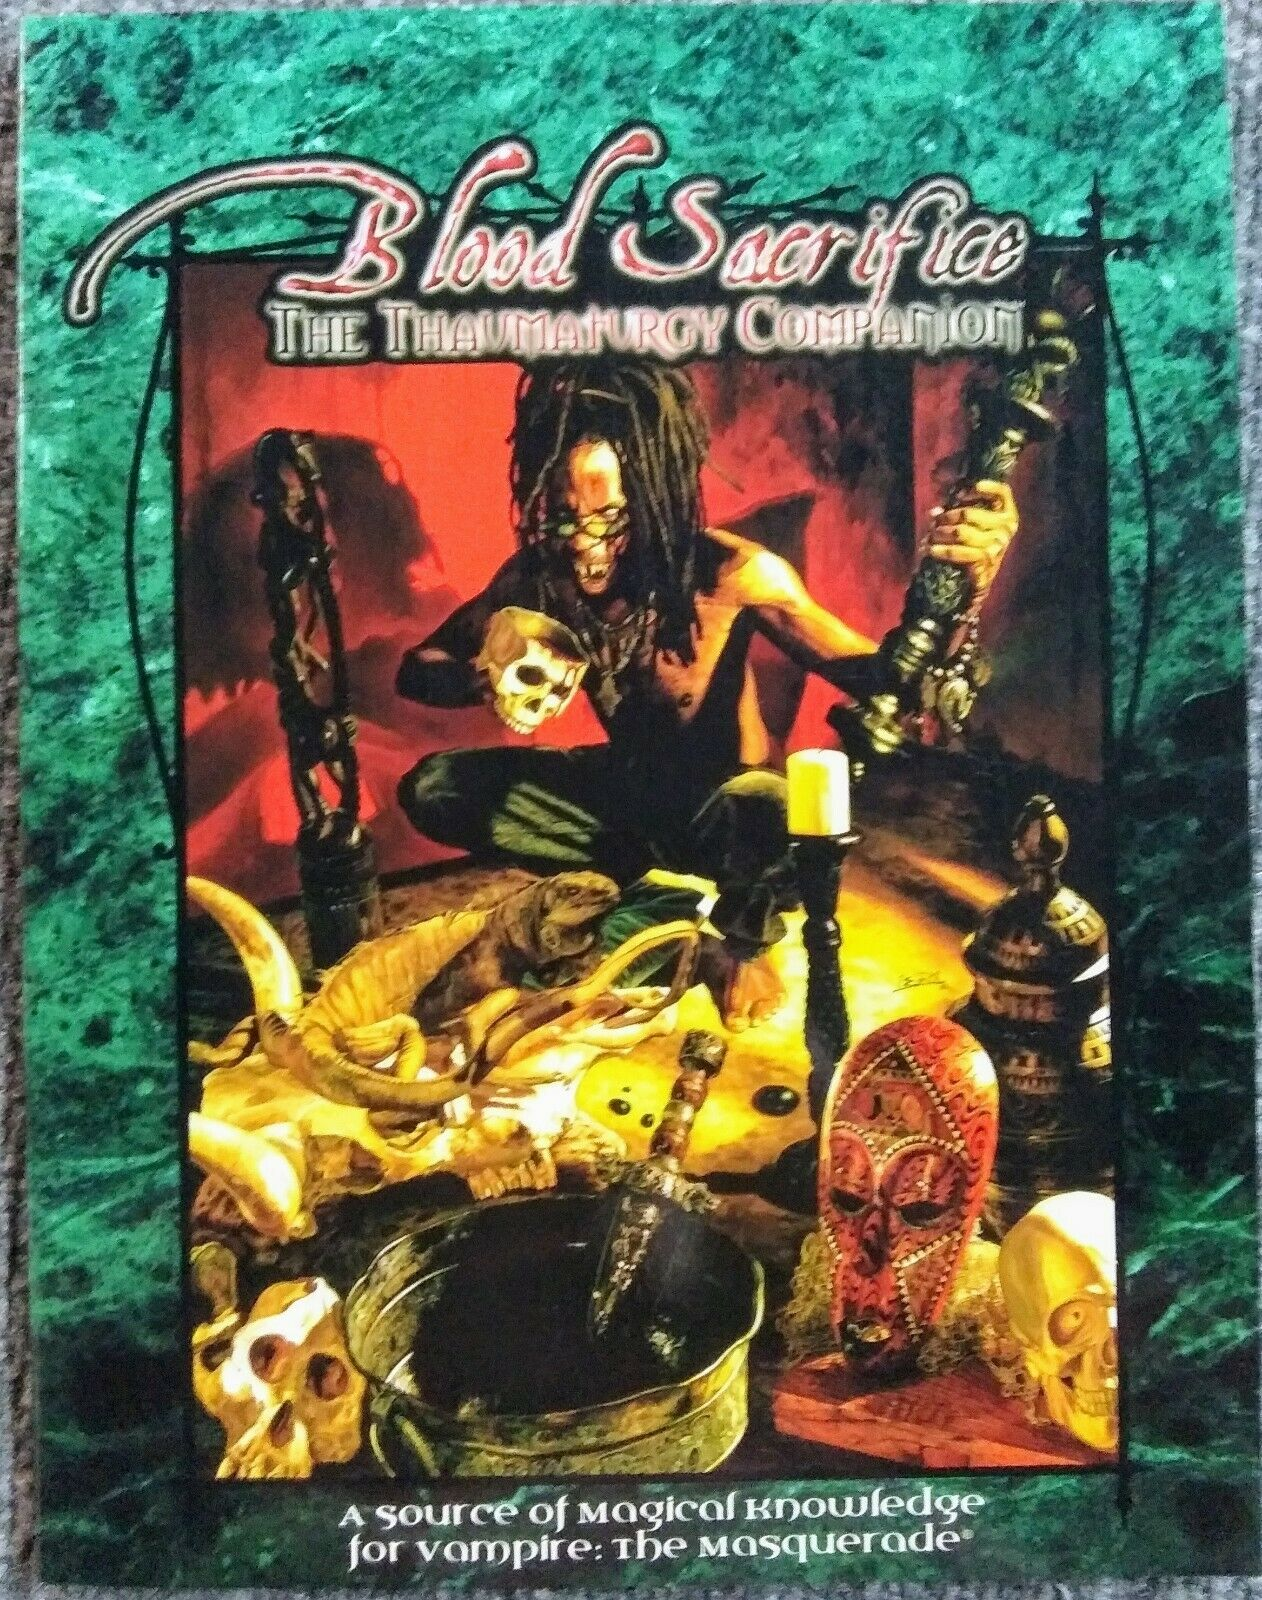 Vampire  The Masquerade - Blood Sacrifice The  Thaumaturgy Companion SC nuovo RPG  prezzi bassissimi